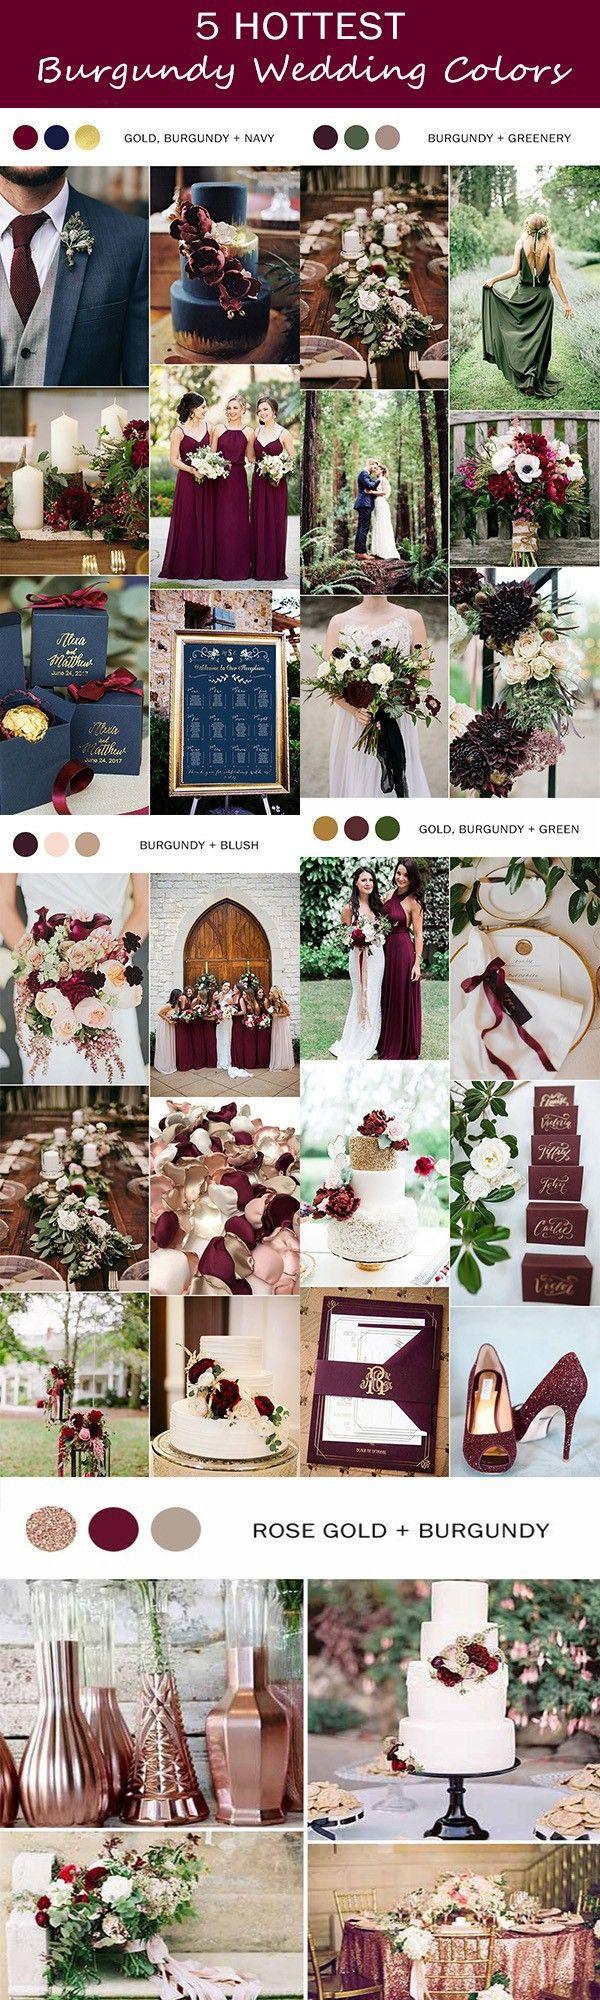 5 trending burgundy wedding color ideas